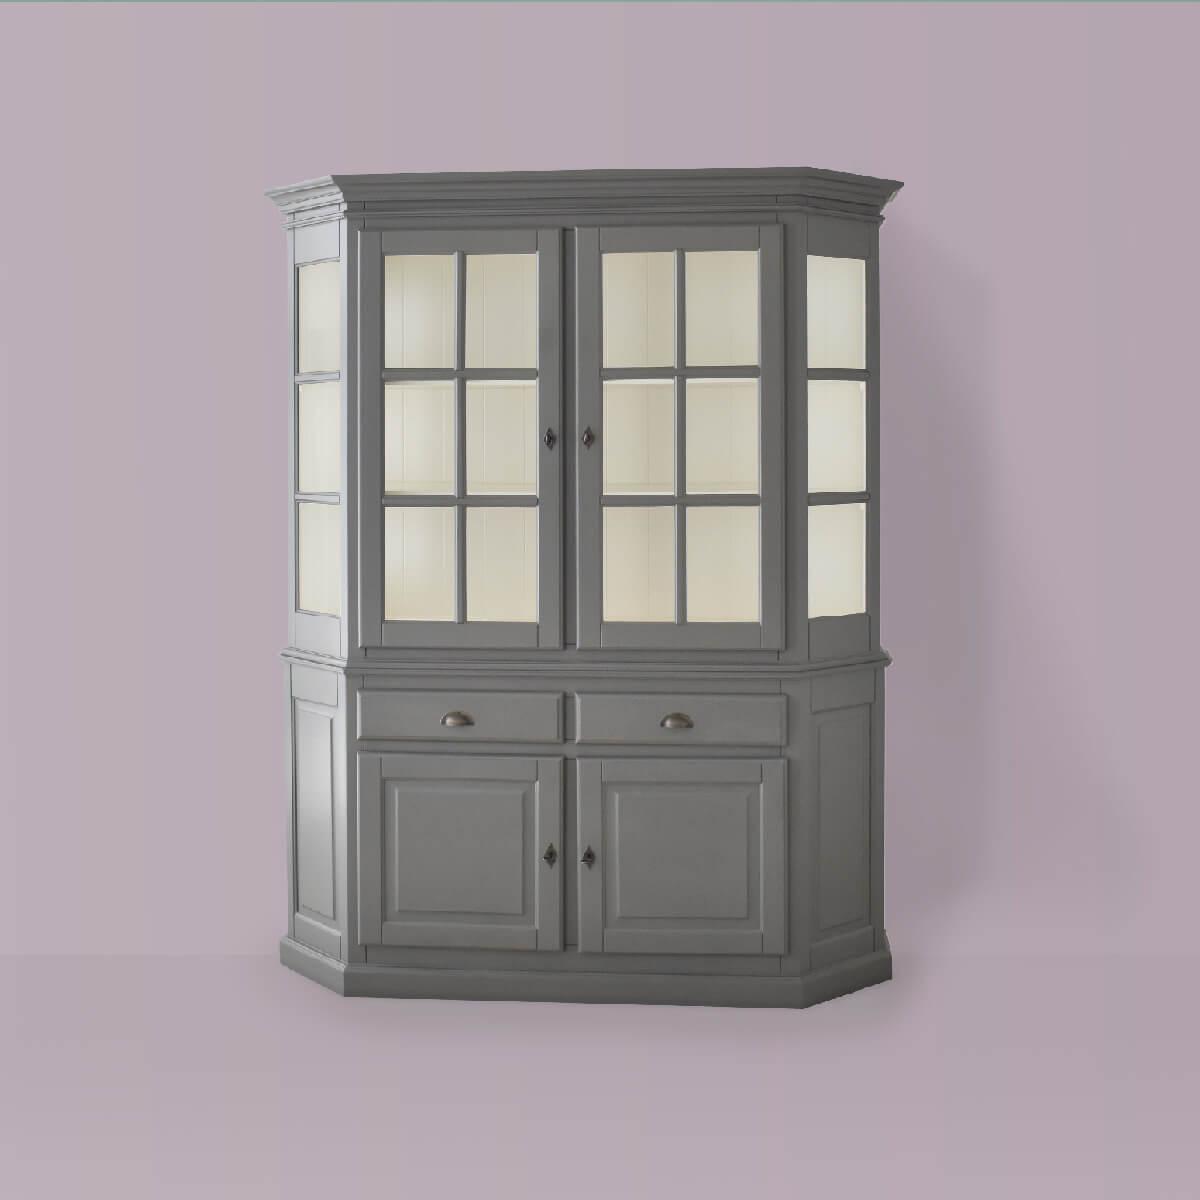 Cabinet3-cozyhome